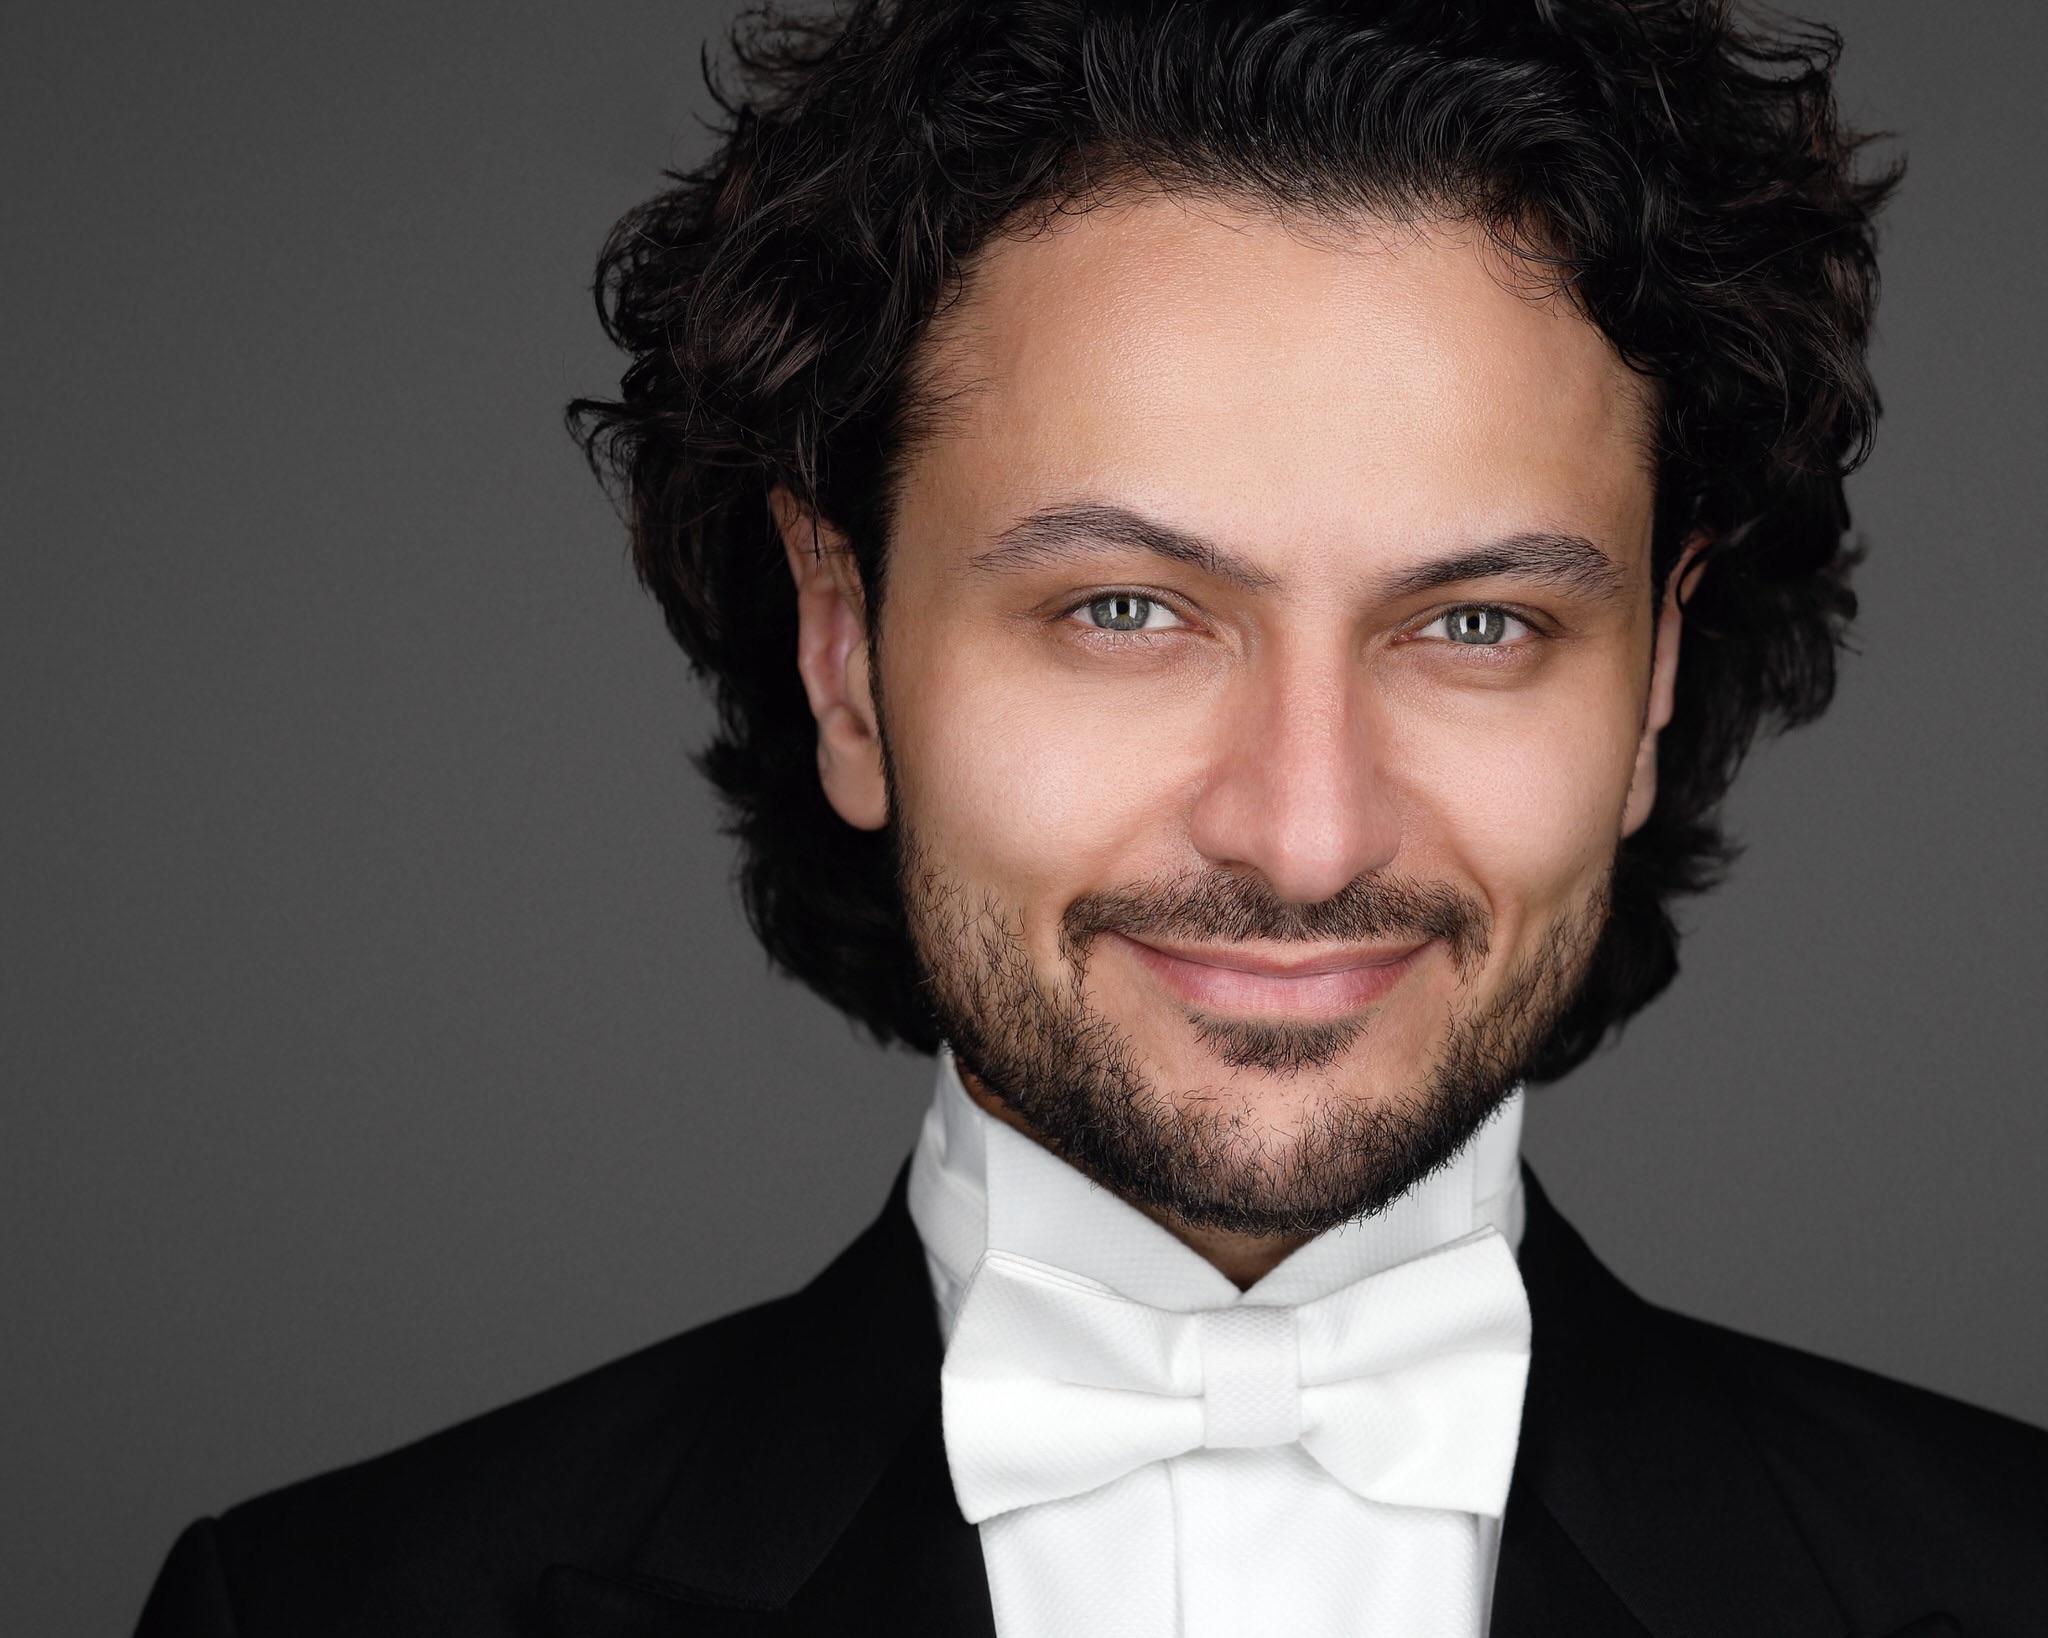 book opera singer, hire singer for event